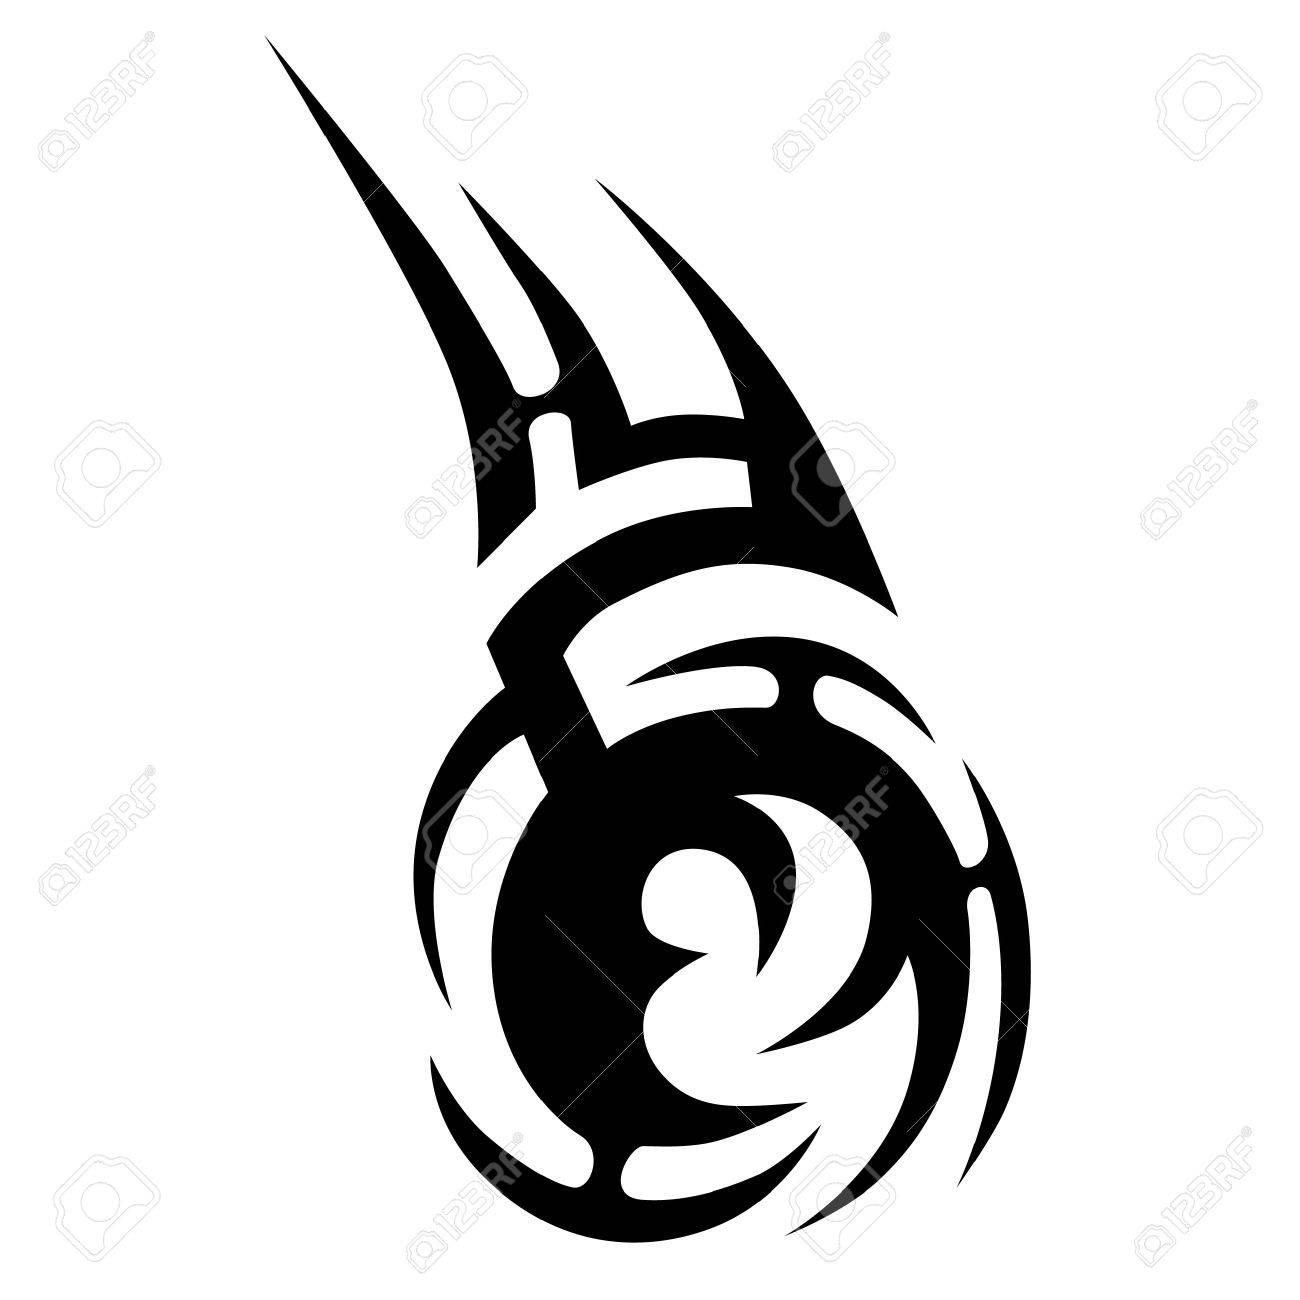 tattoo tribal vector designs tribal tattoos art tribal tattoo rh 123rf com vector tattoo old school vector tattoo machine